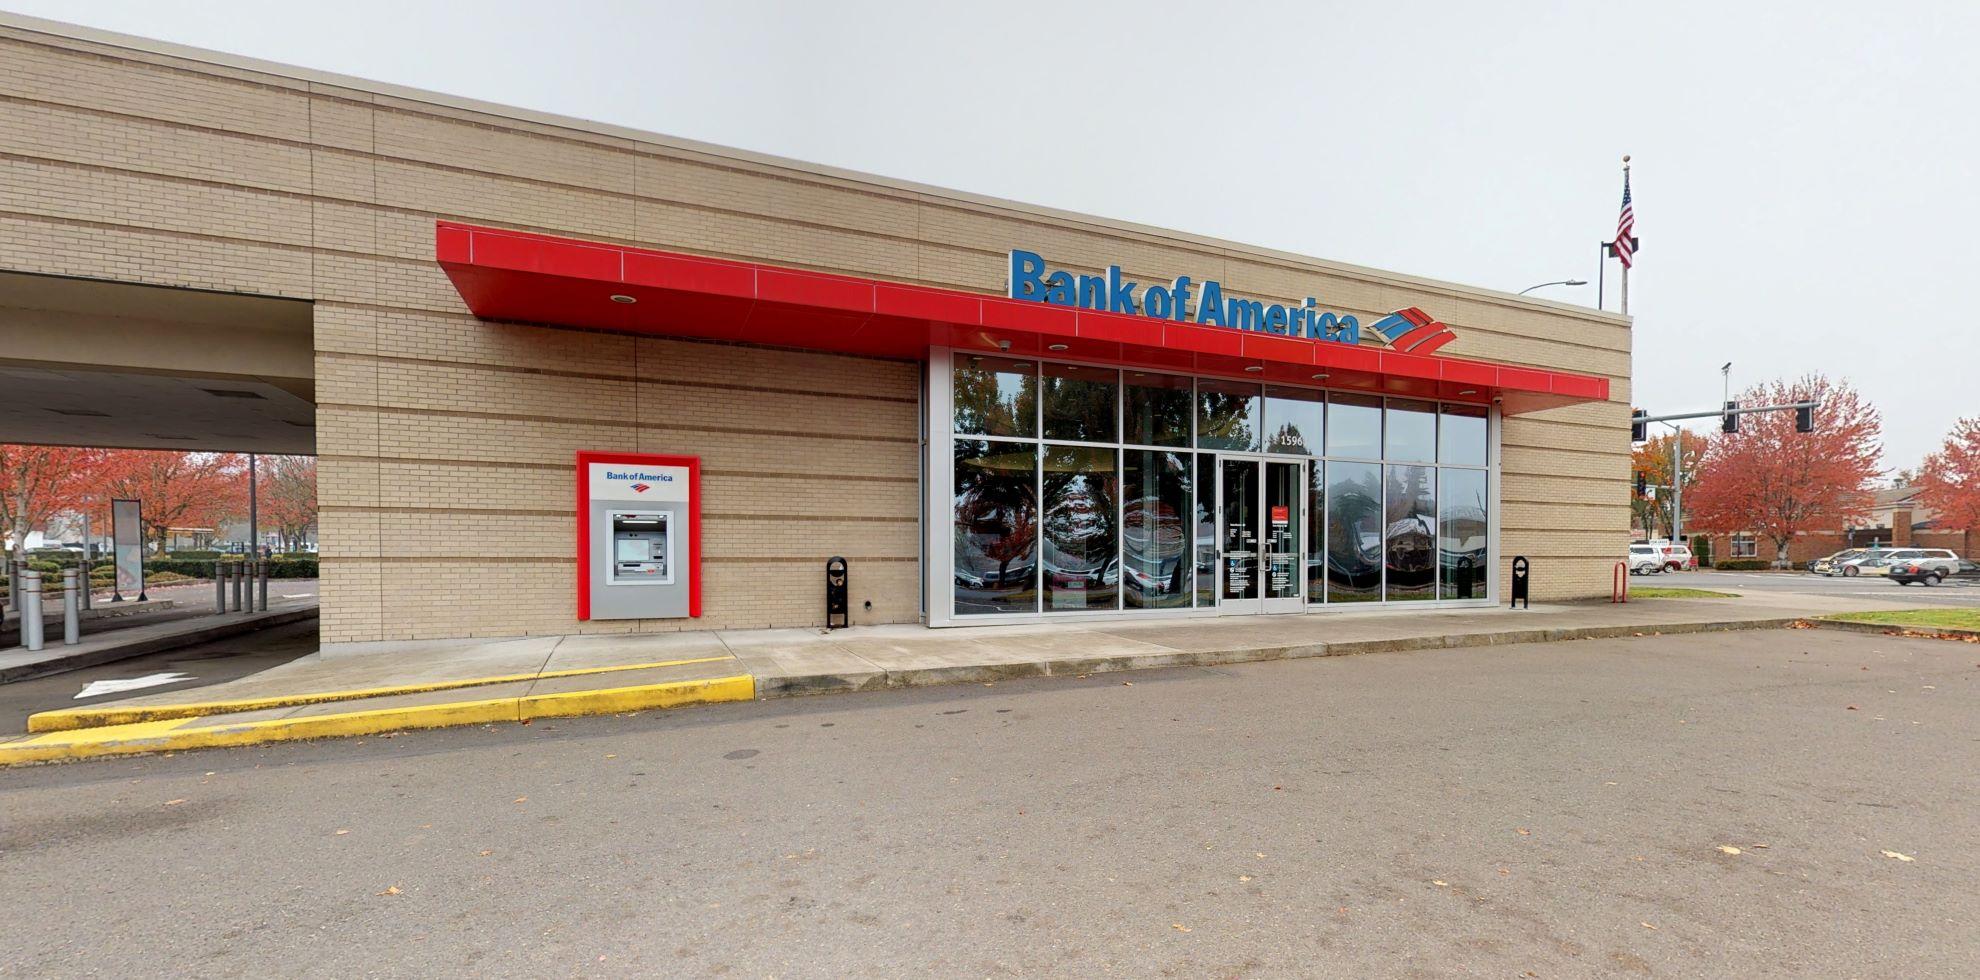 Bank of America financial center with drive-thru ATM | 15961 SW Tualatin Sherwood Rd, Sherwood, OR 97140